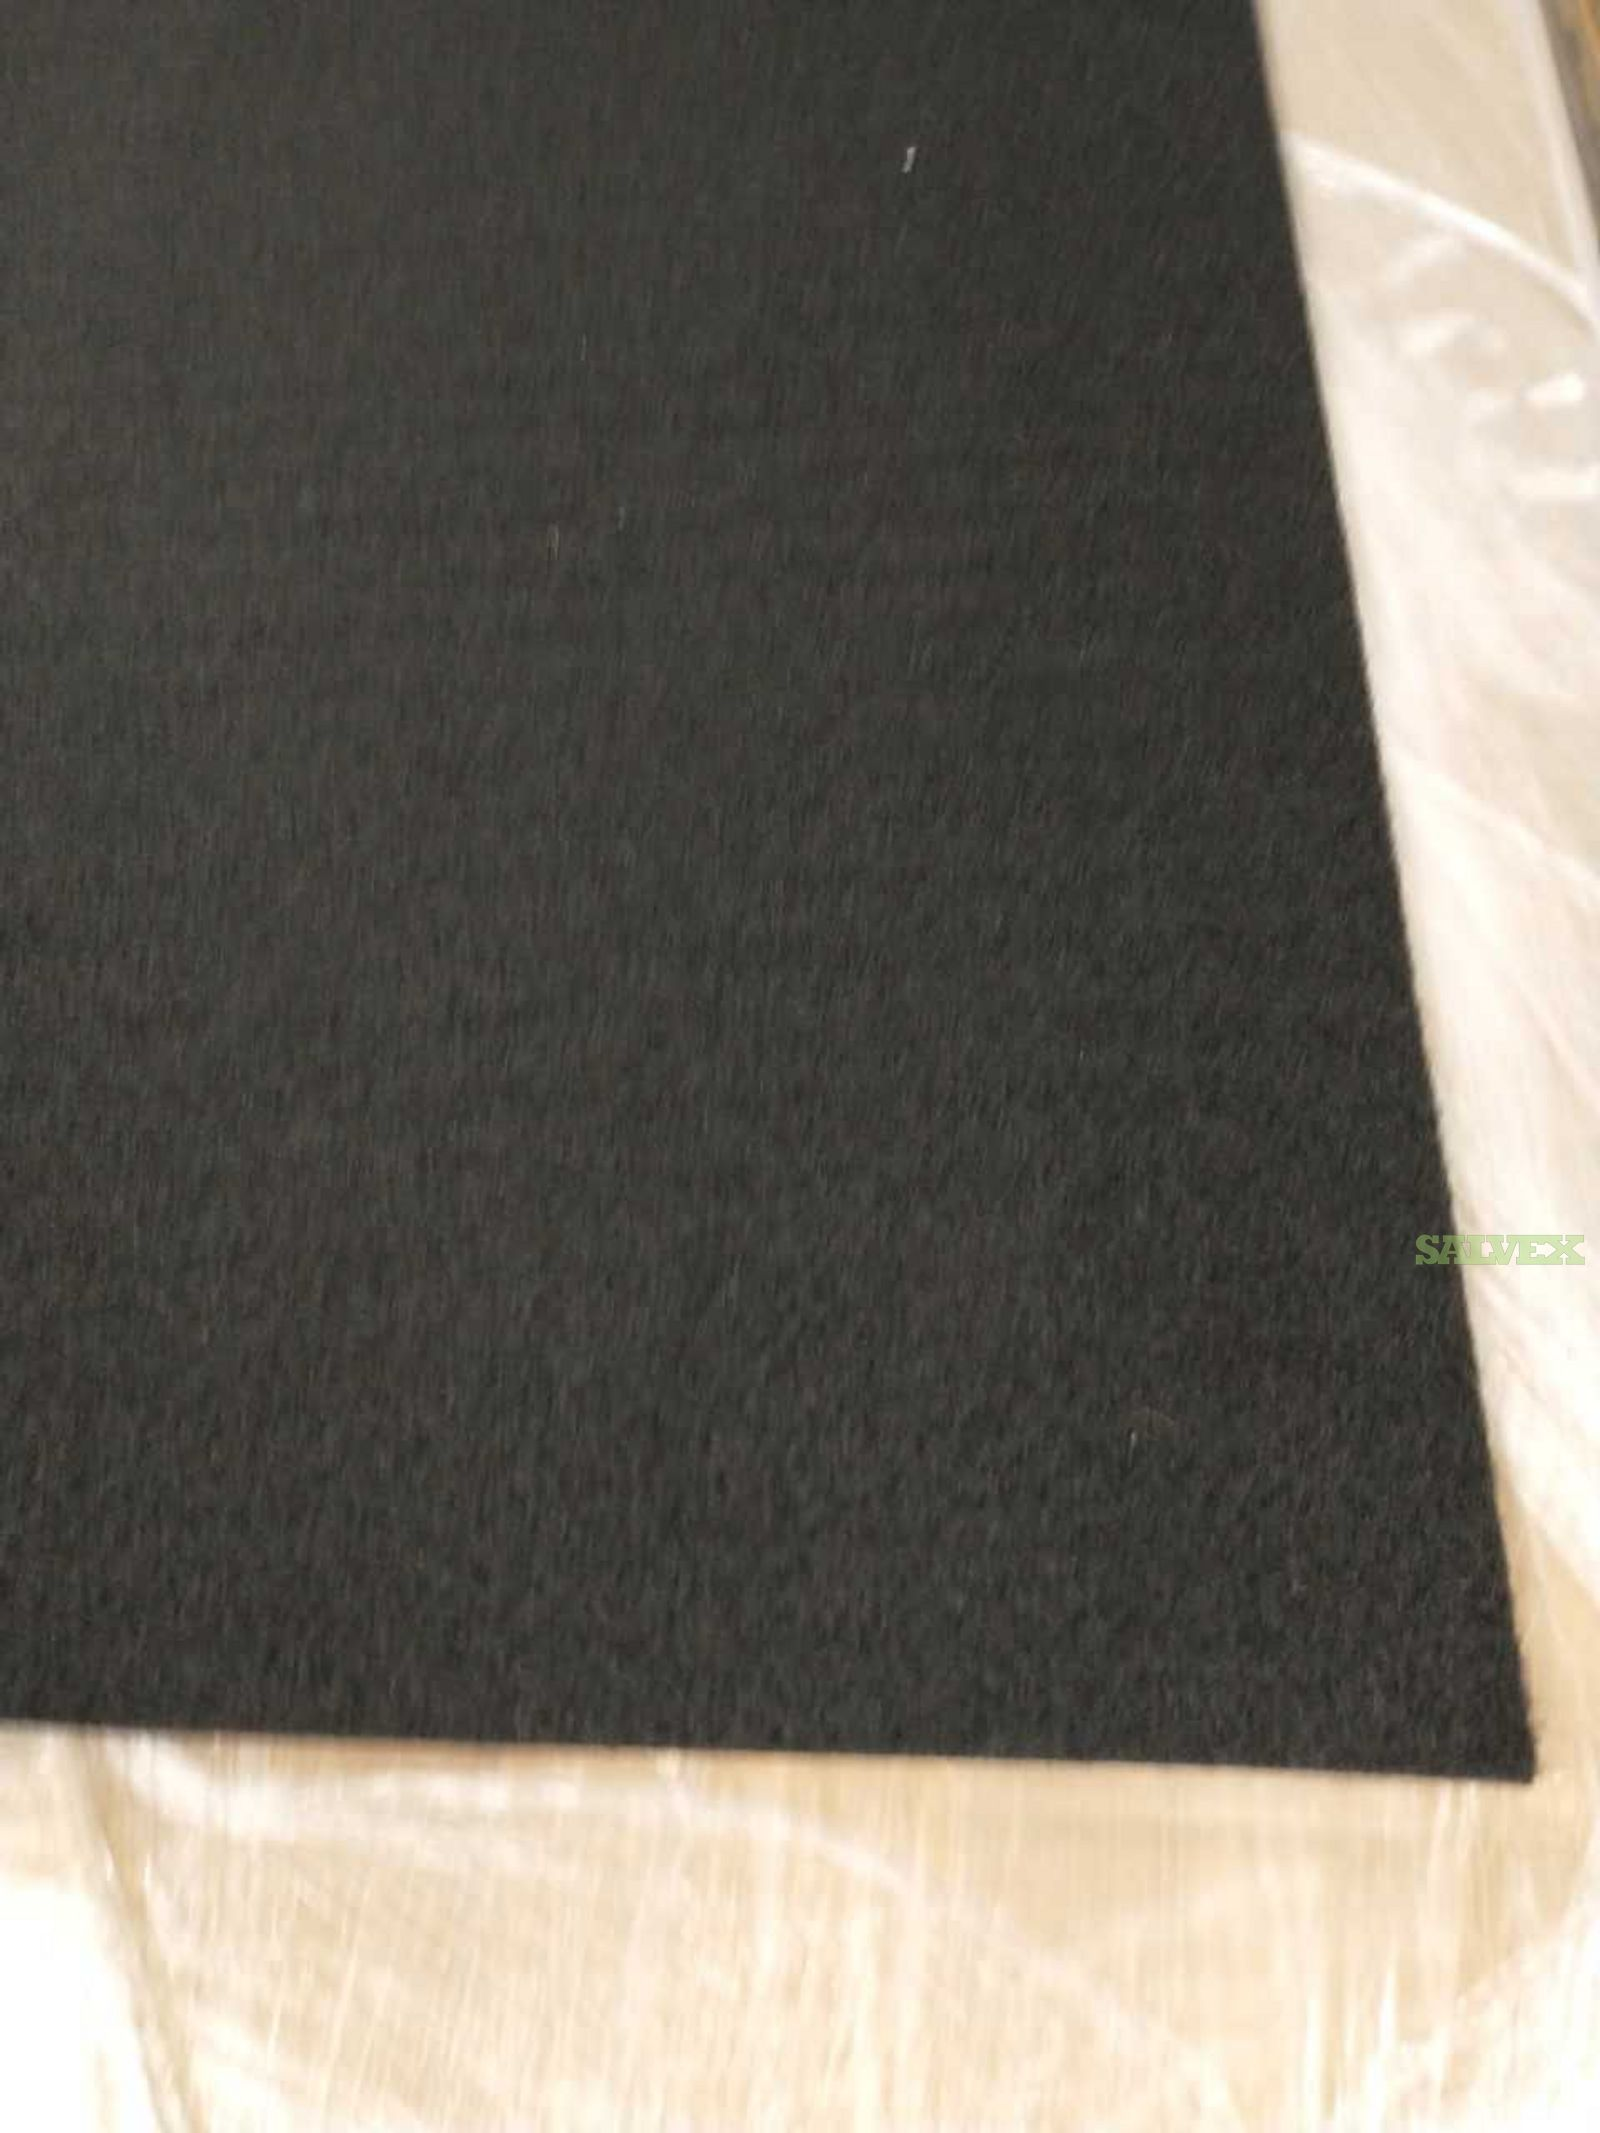 Shaw Industries Super Duty Walk Off Carpet Tile -Black - 3,700 sq. ft.